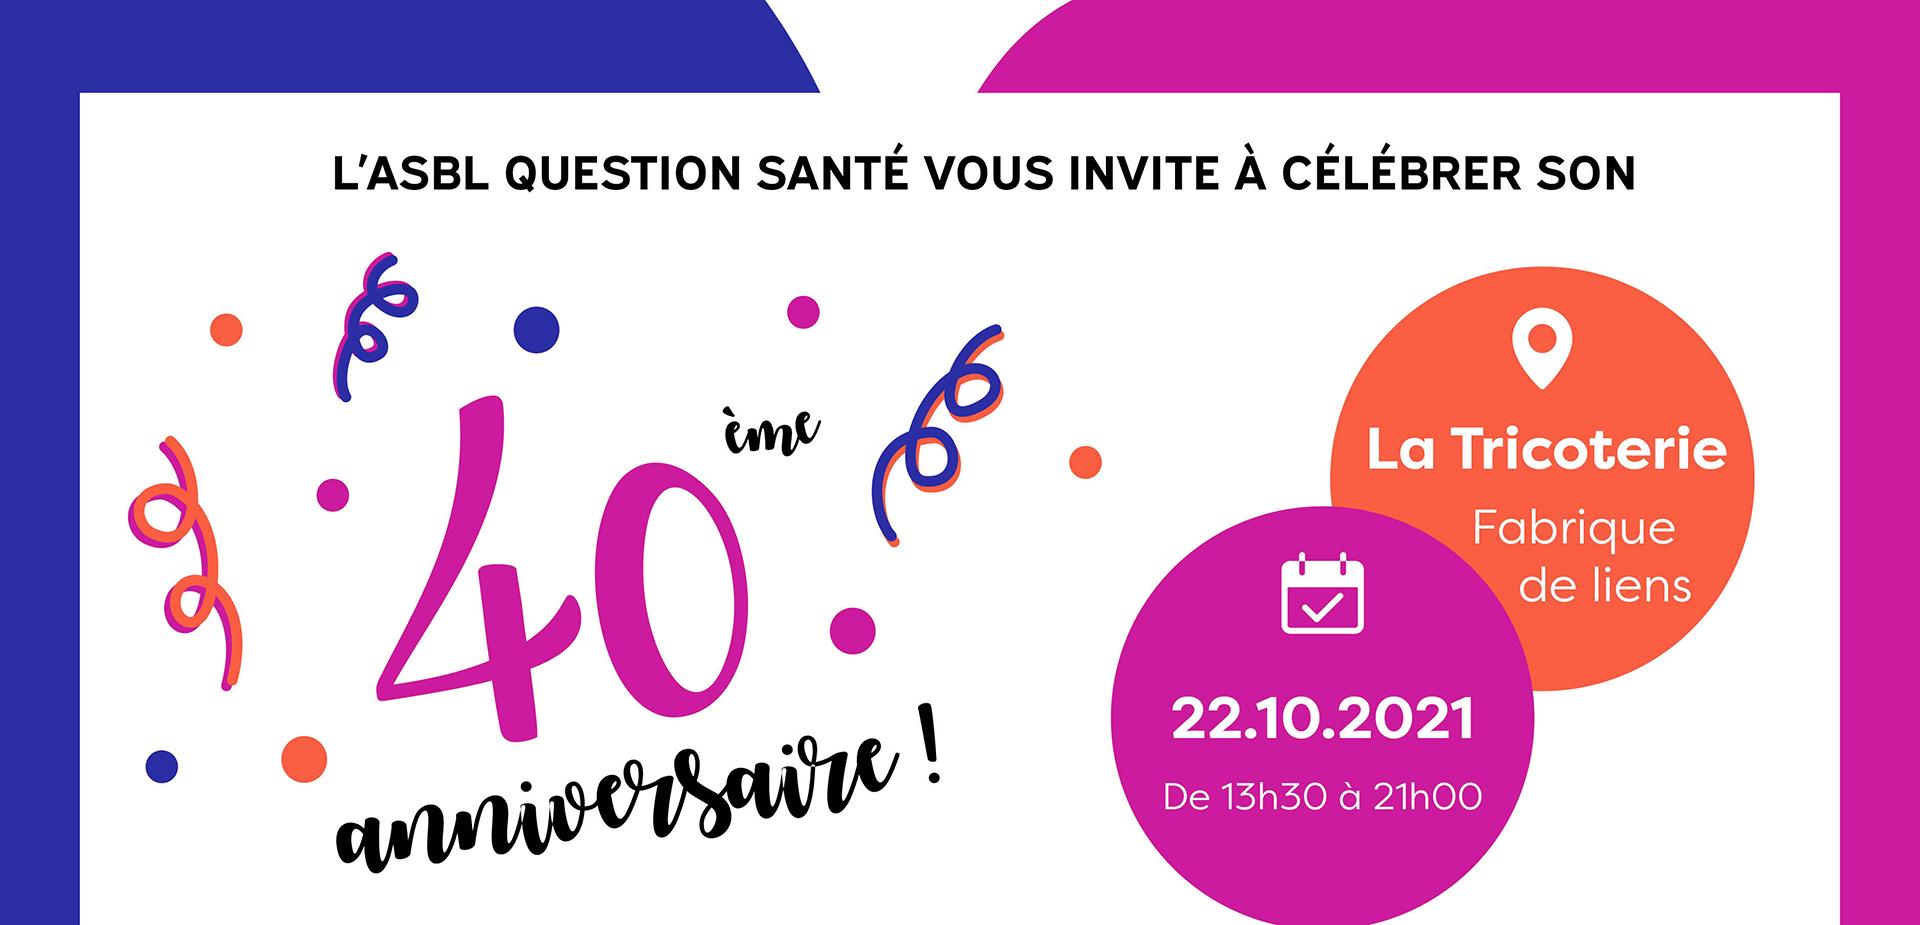 20211022 Qs Invitation40ans Lc Cover